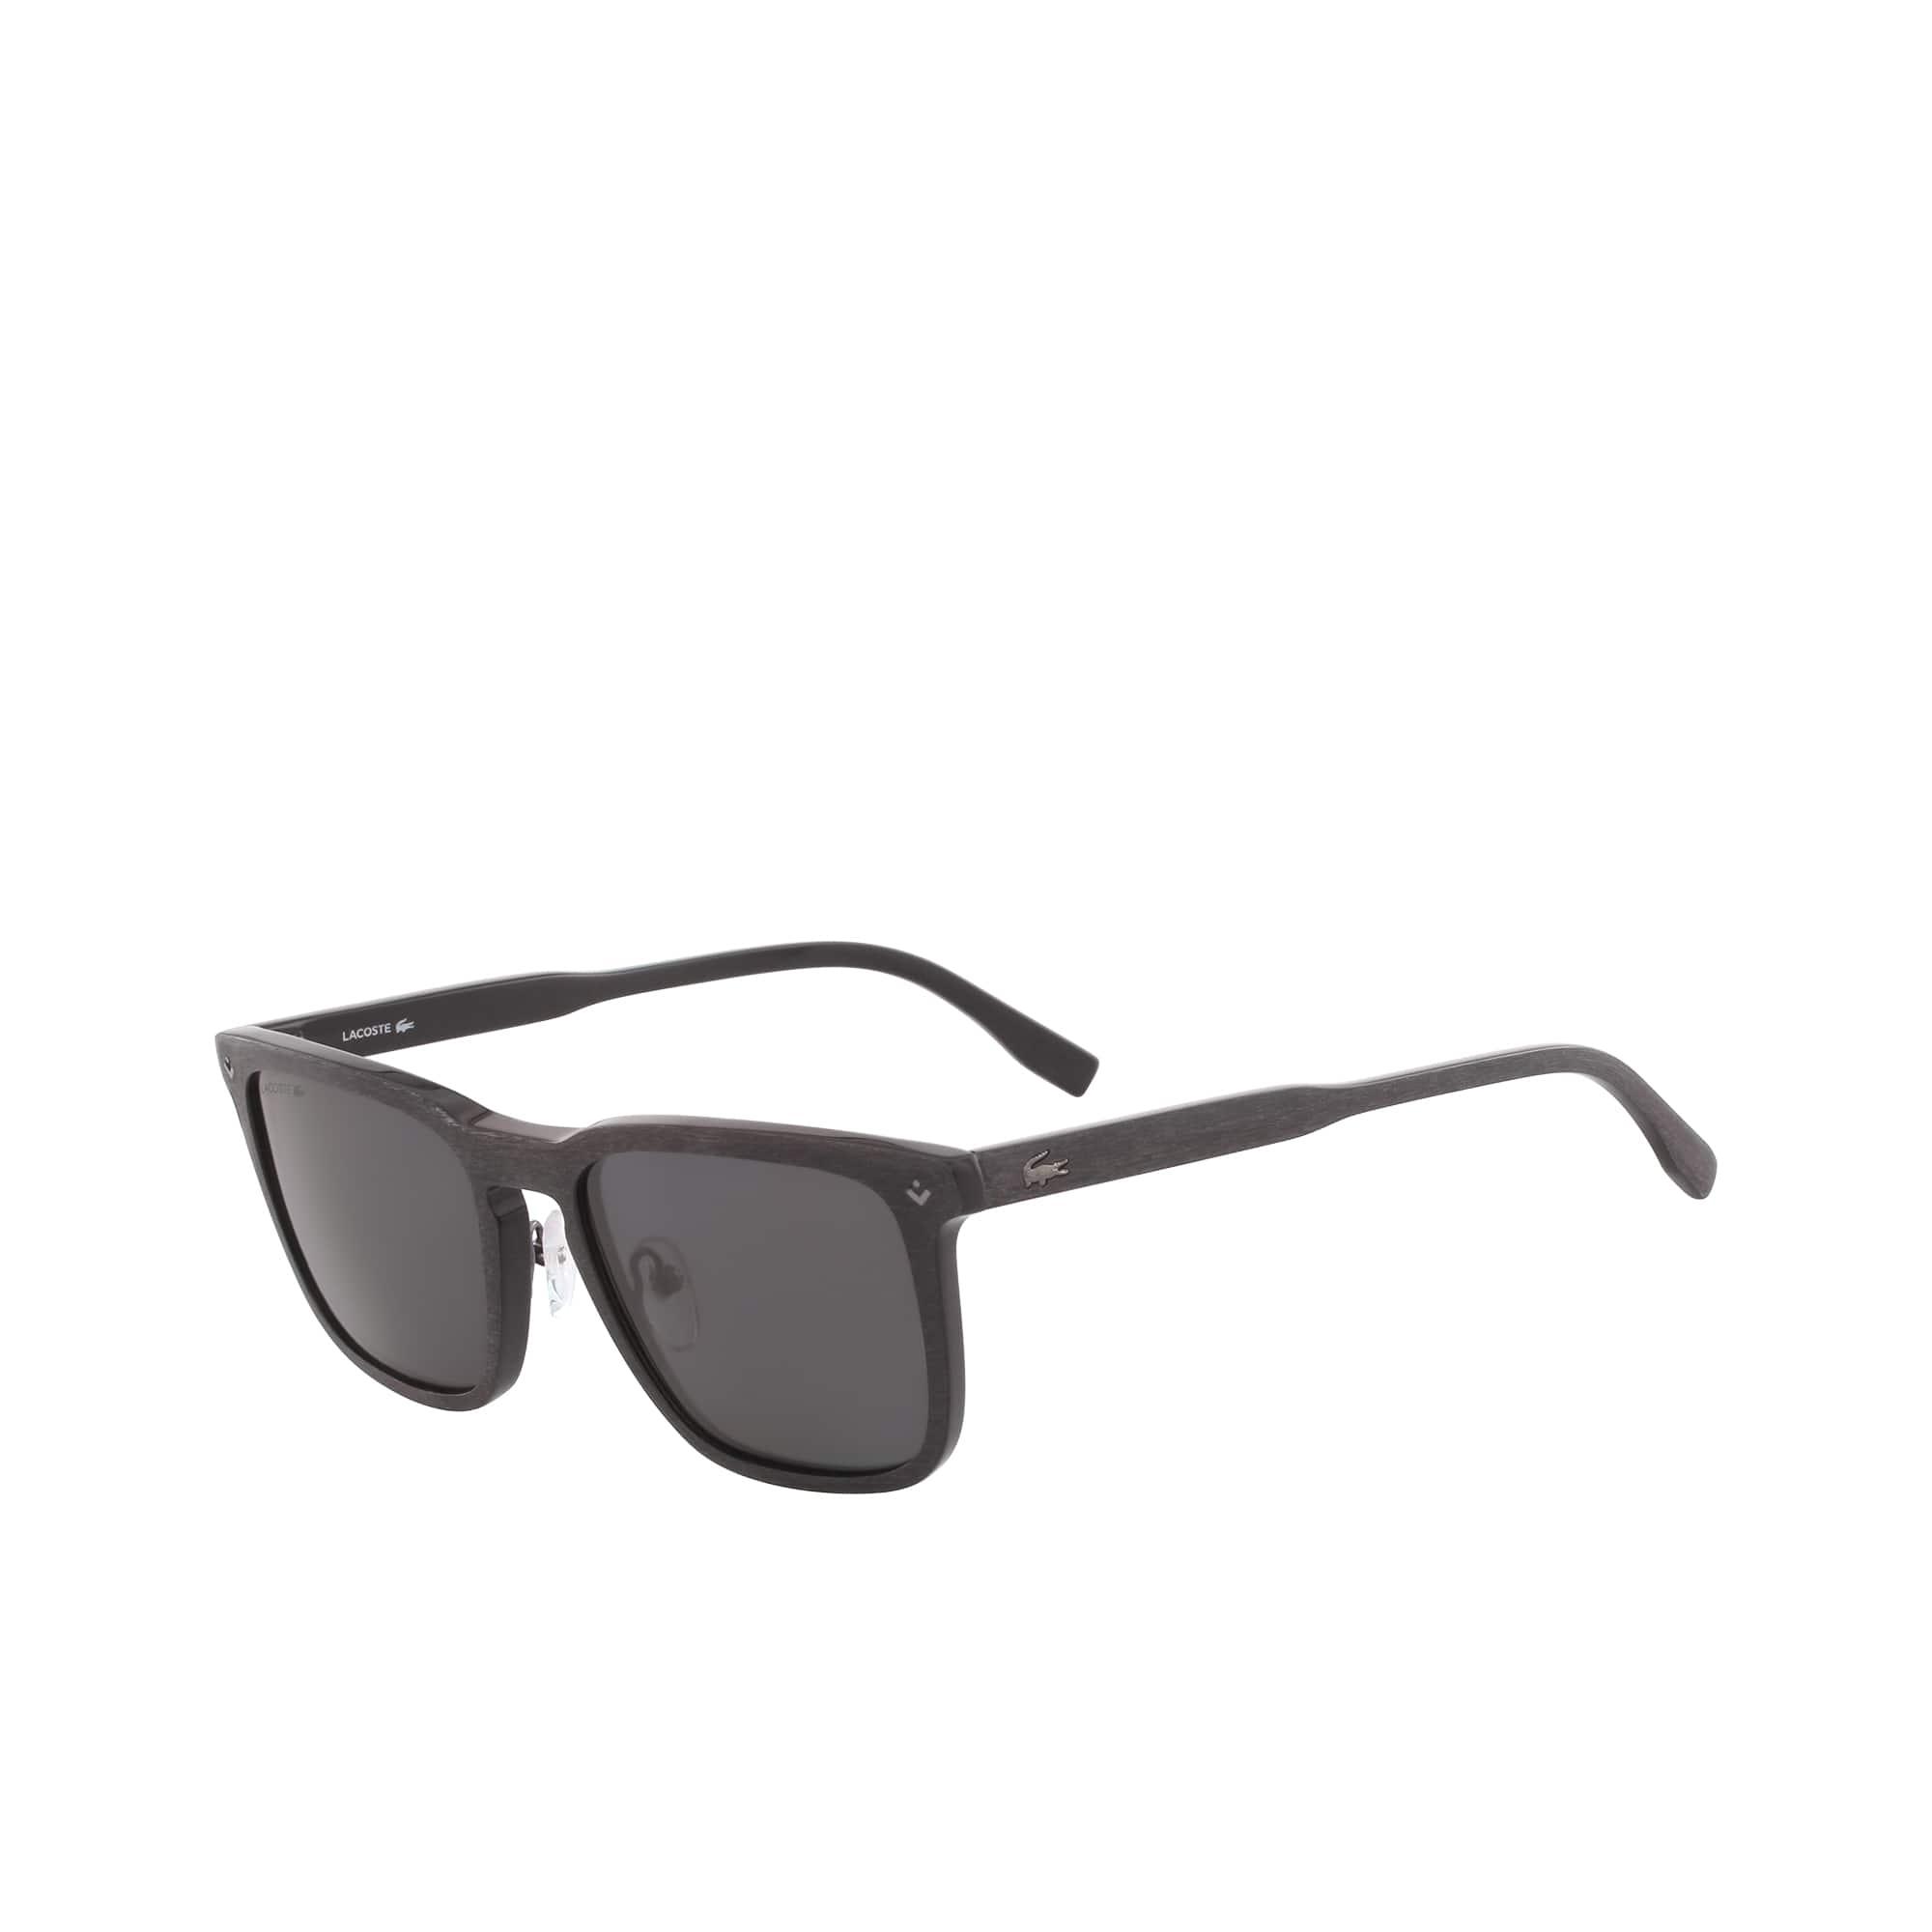 1a2e3daee202 Plastic Paris Polo Sunglasses